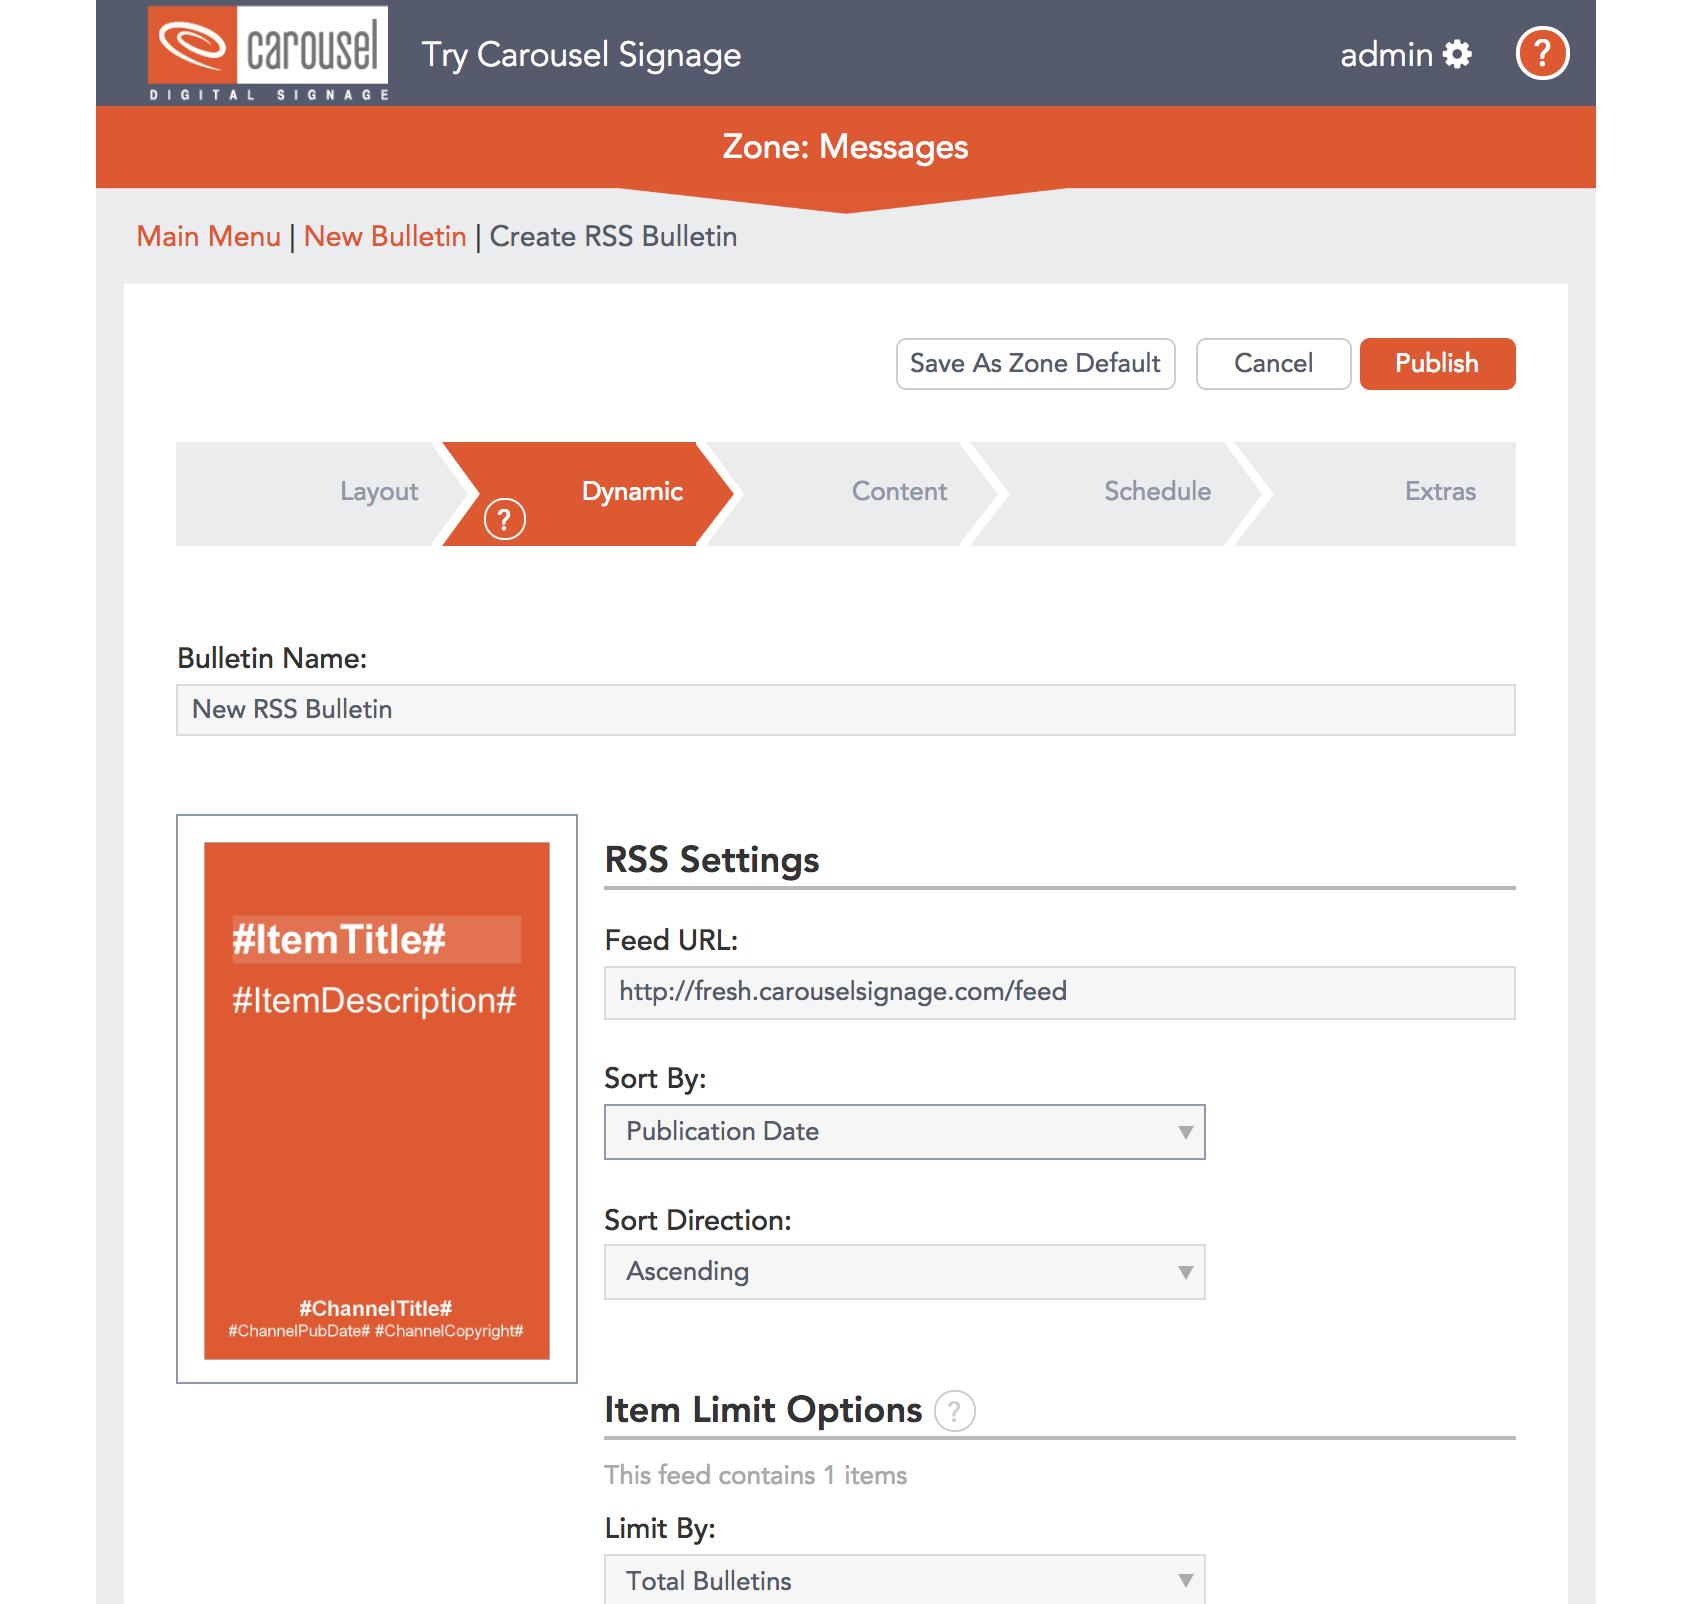 Carousel Digital Signage - Cloud API